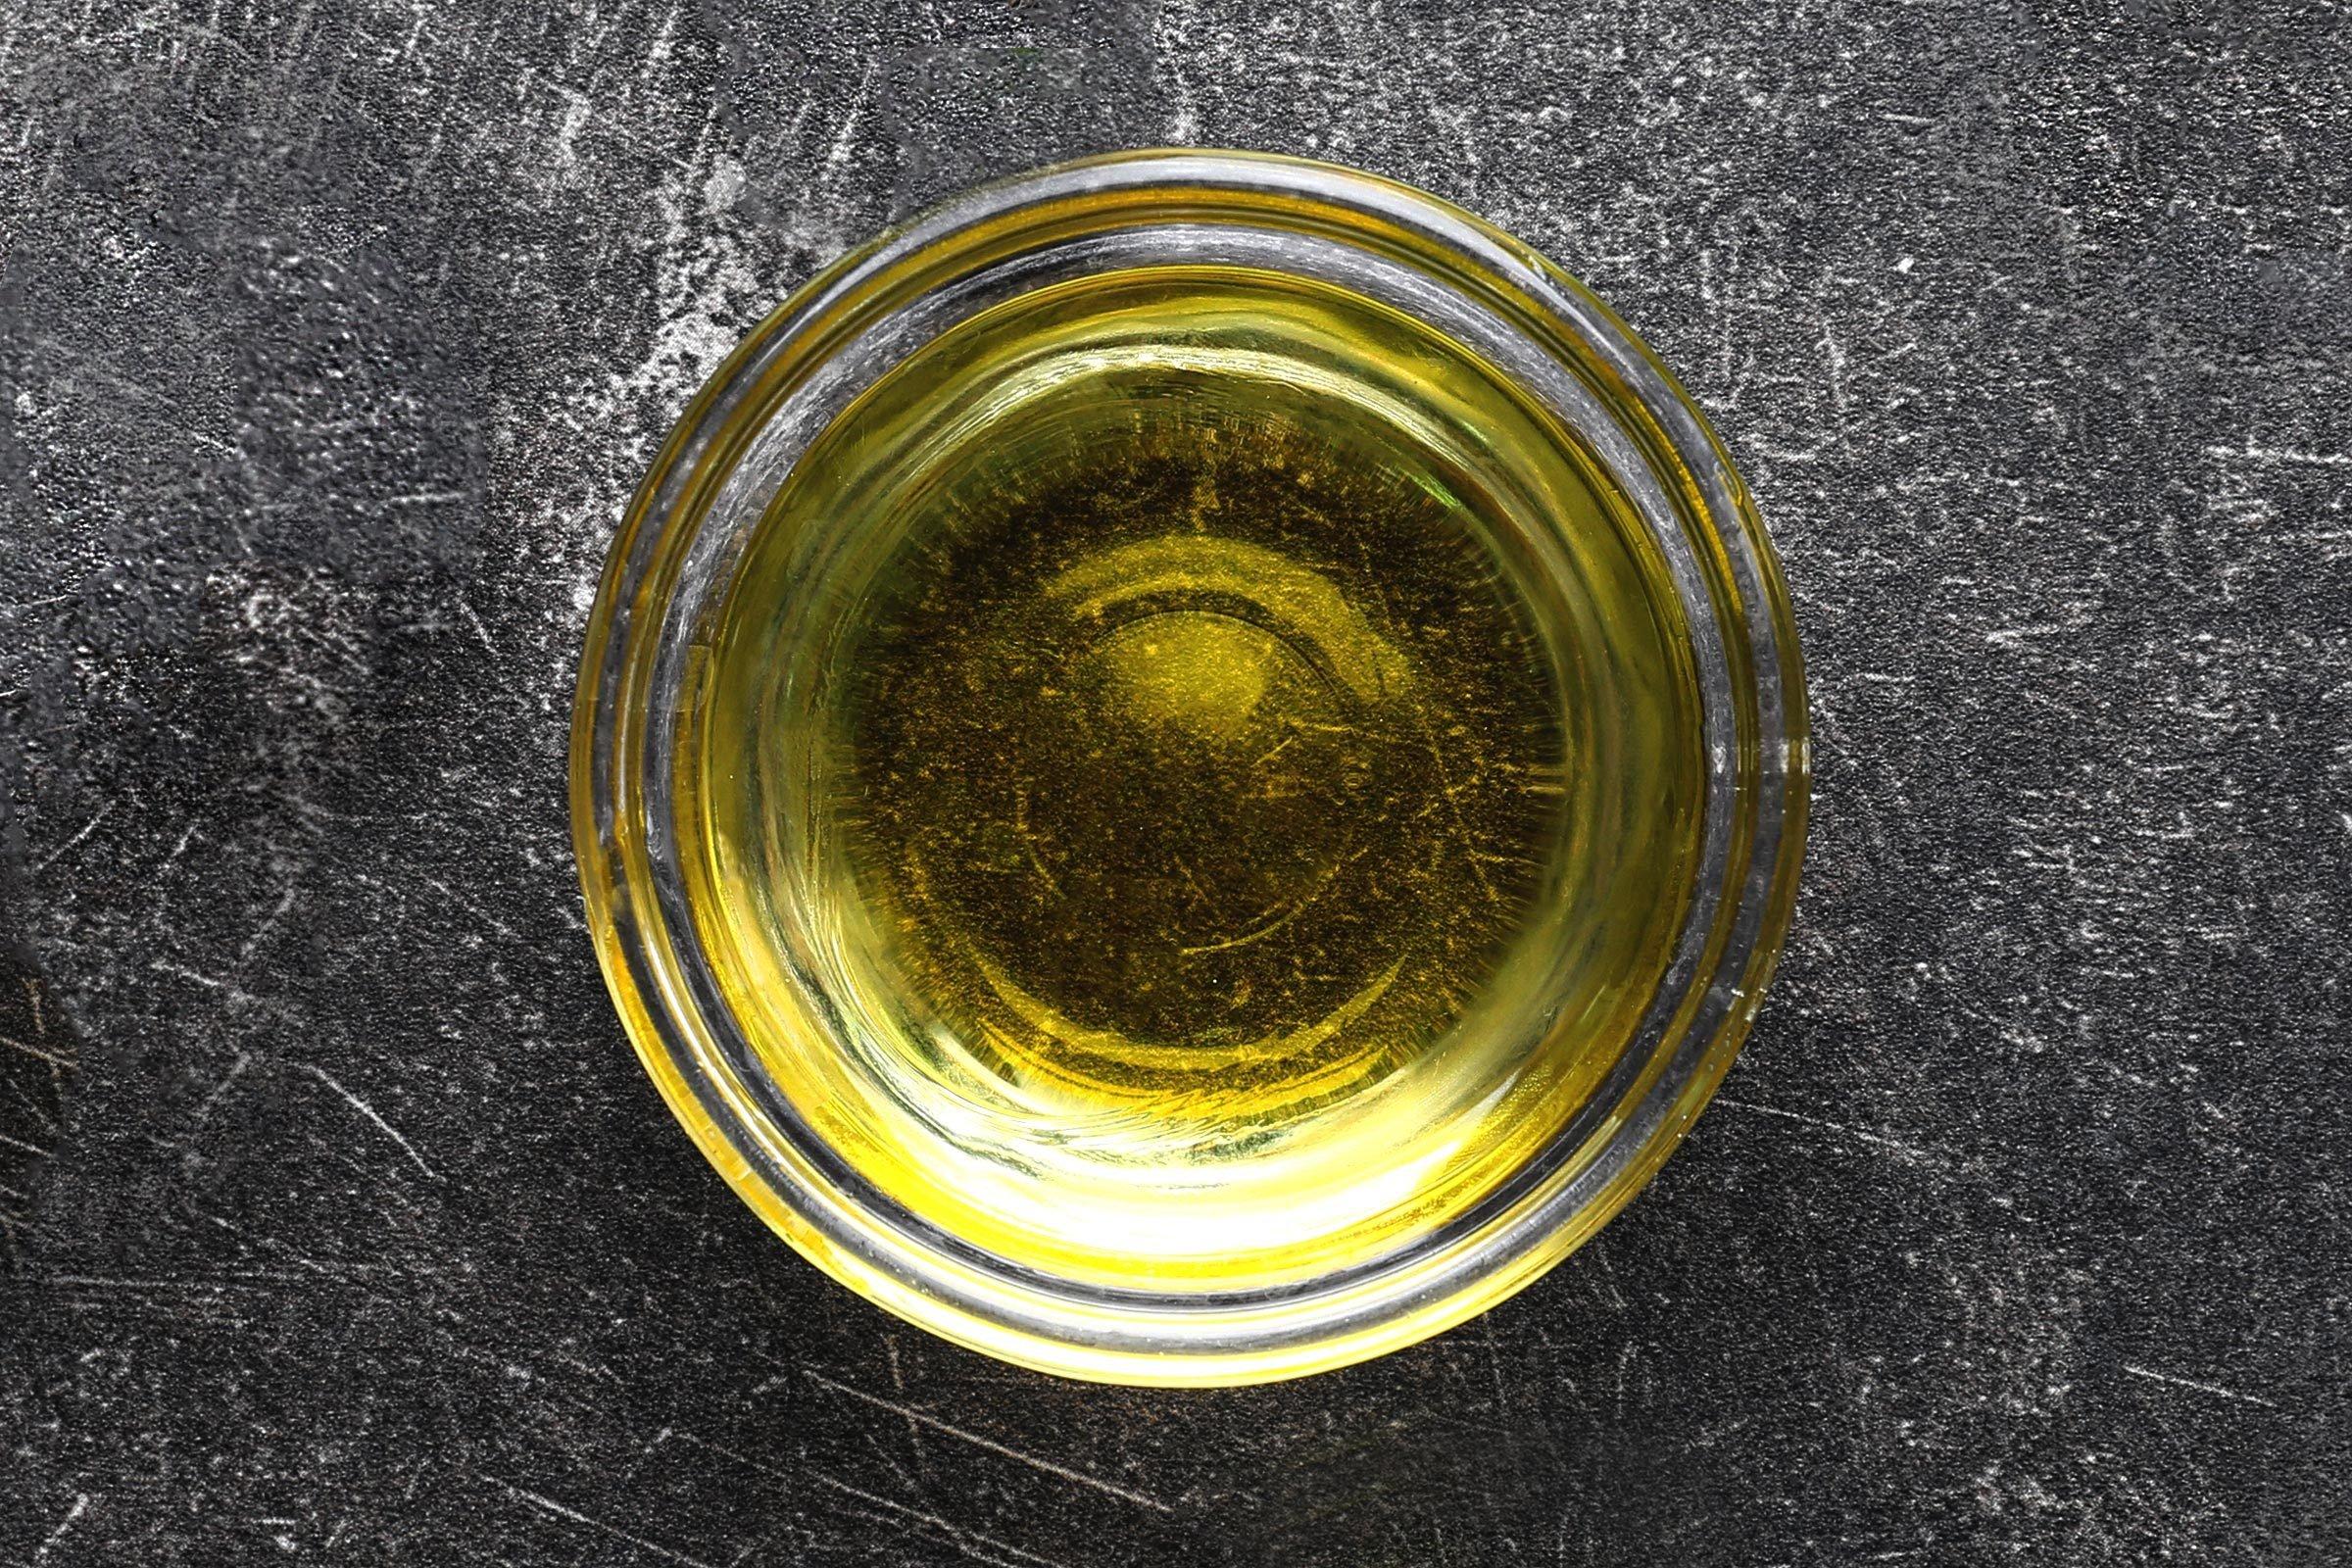 Glass bowl of light olive oil